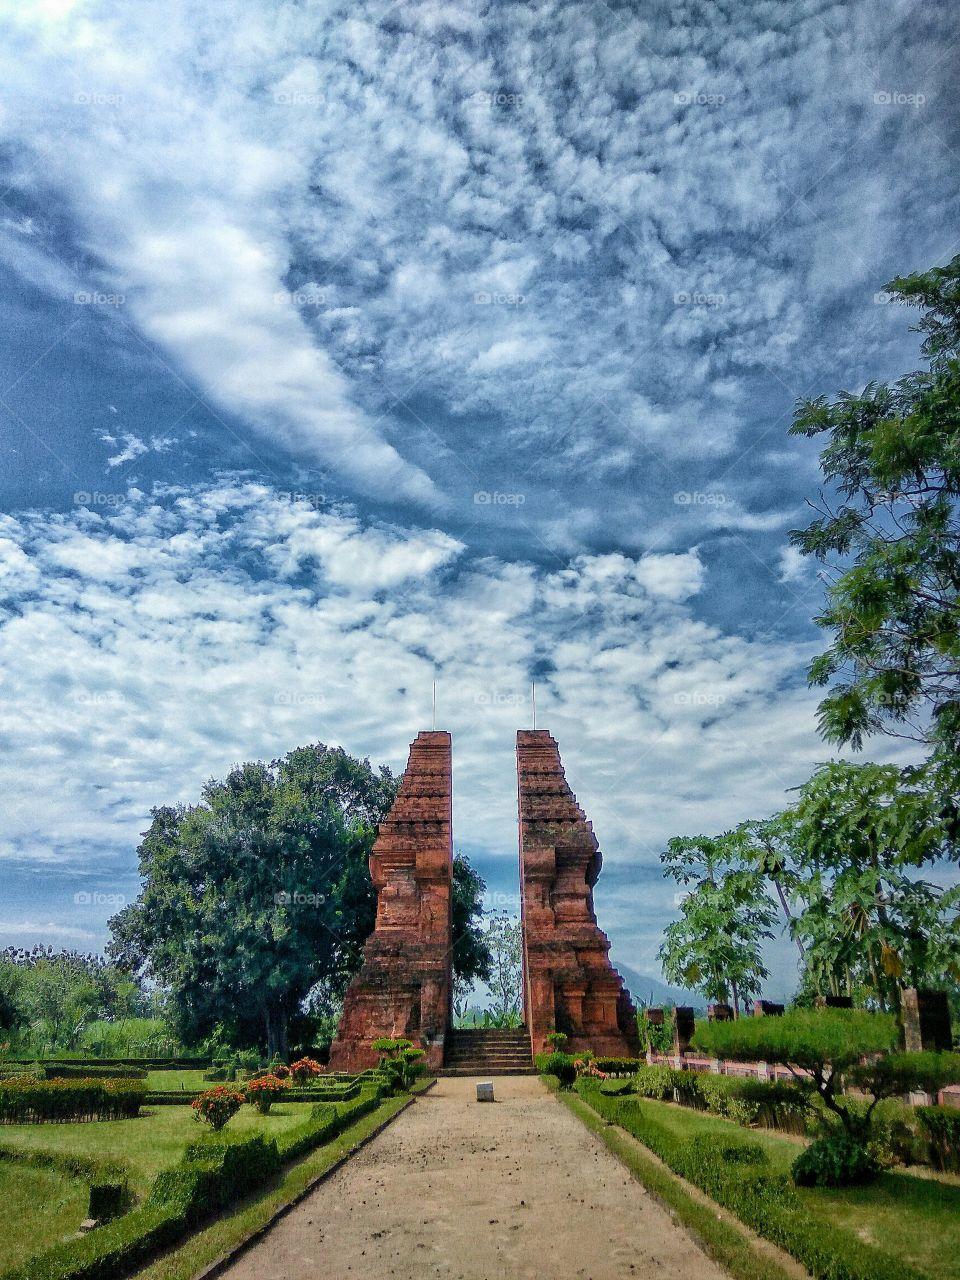 majapahit temple